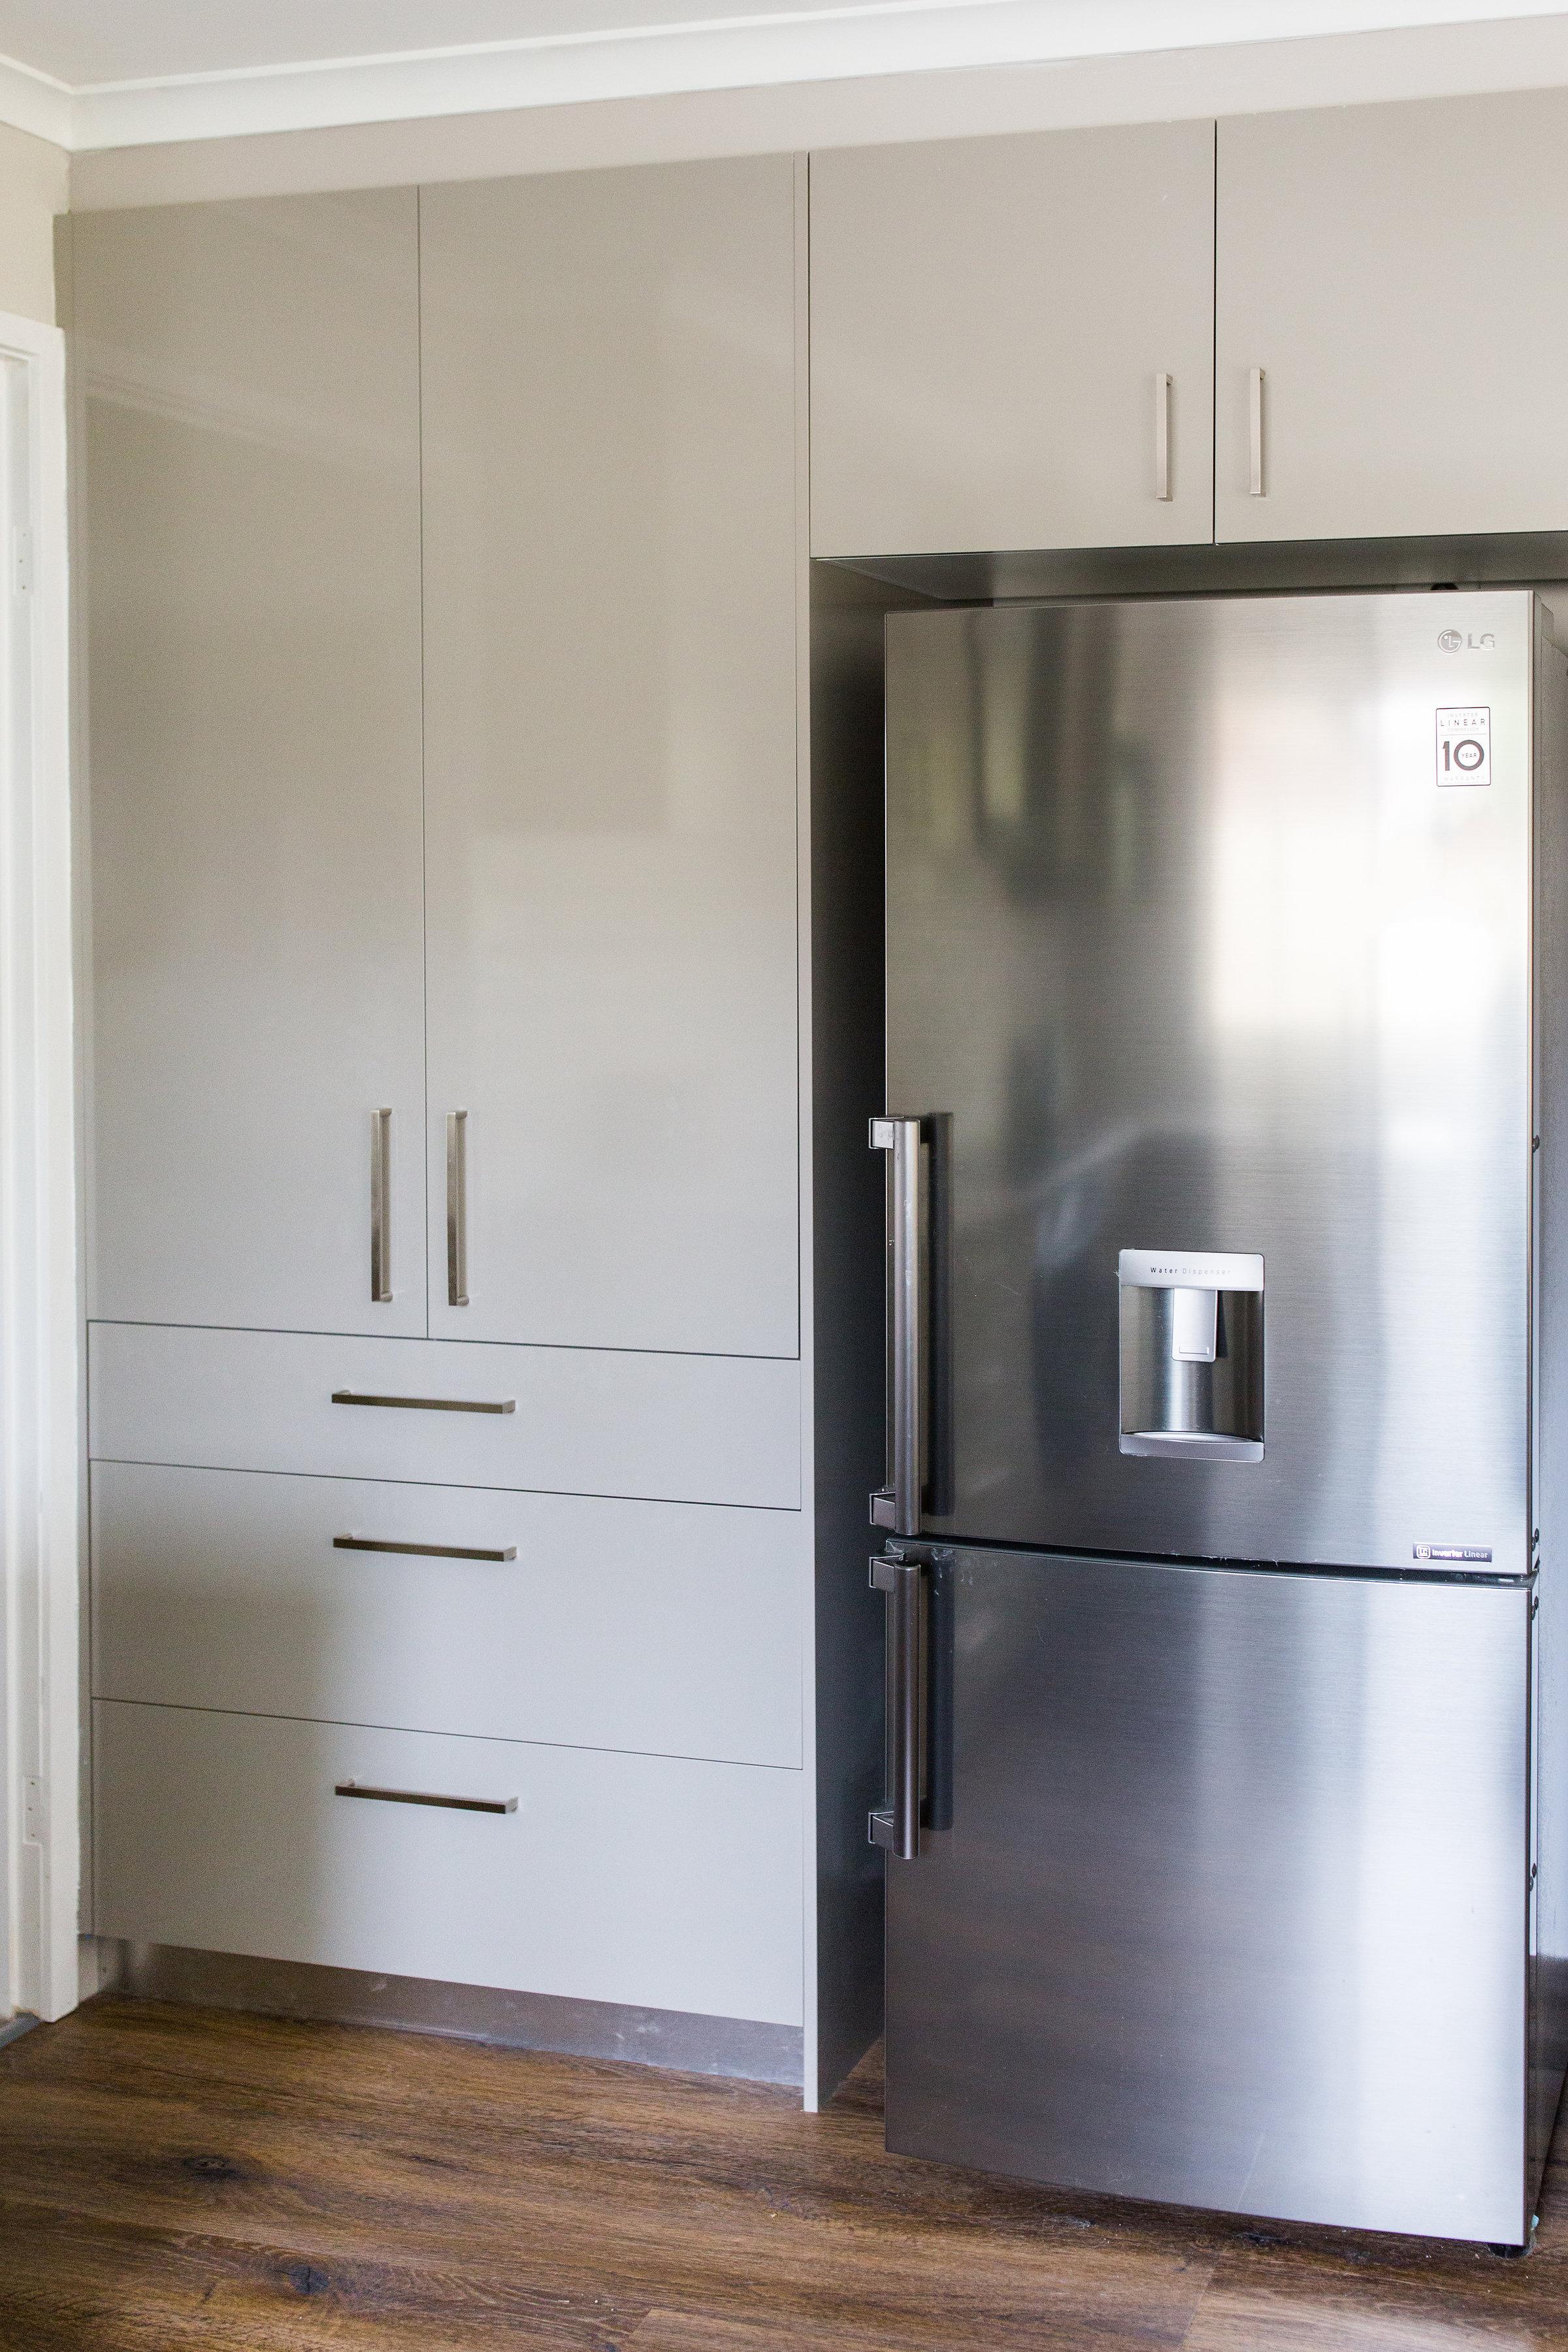 fridge and pantry